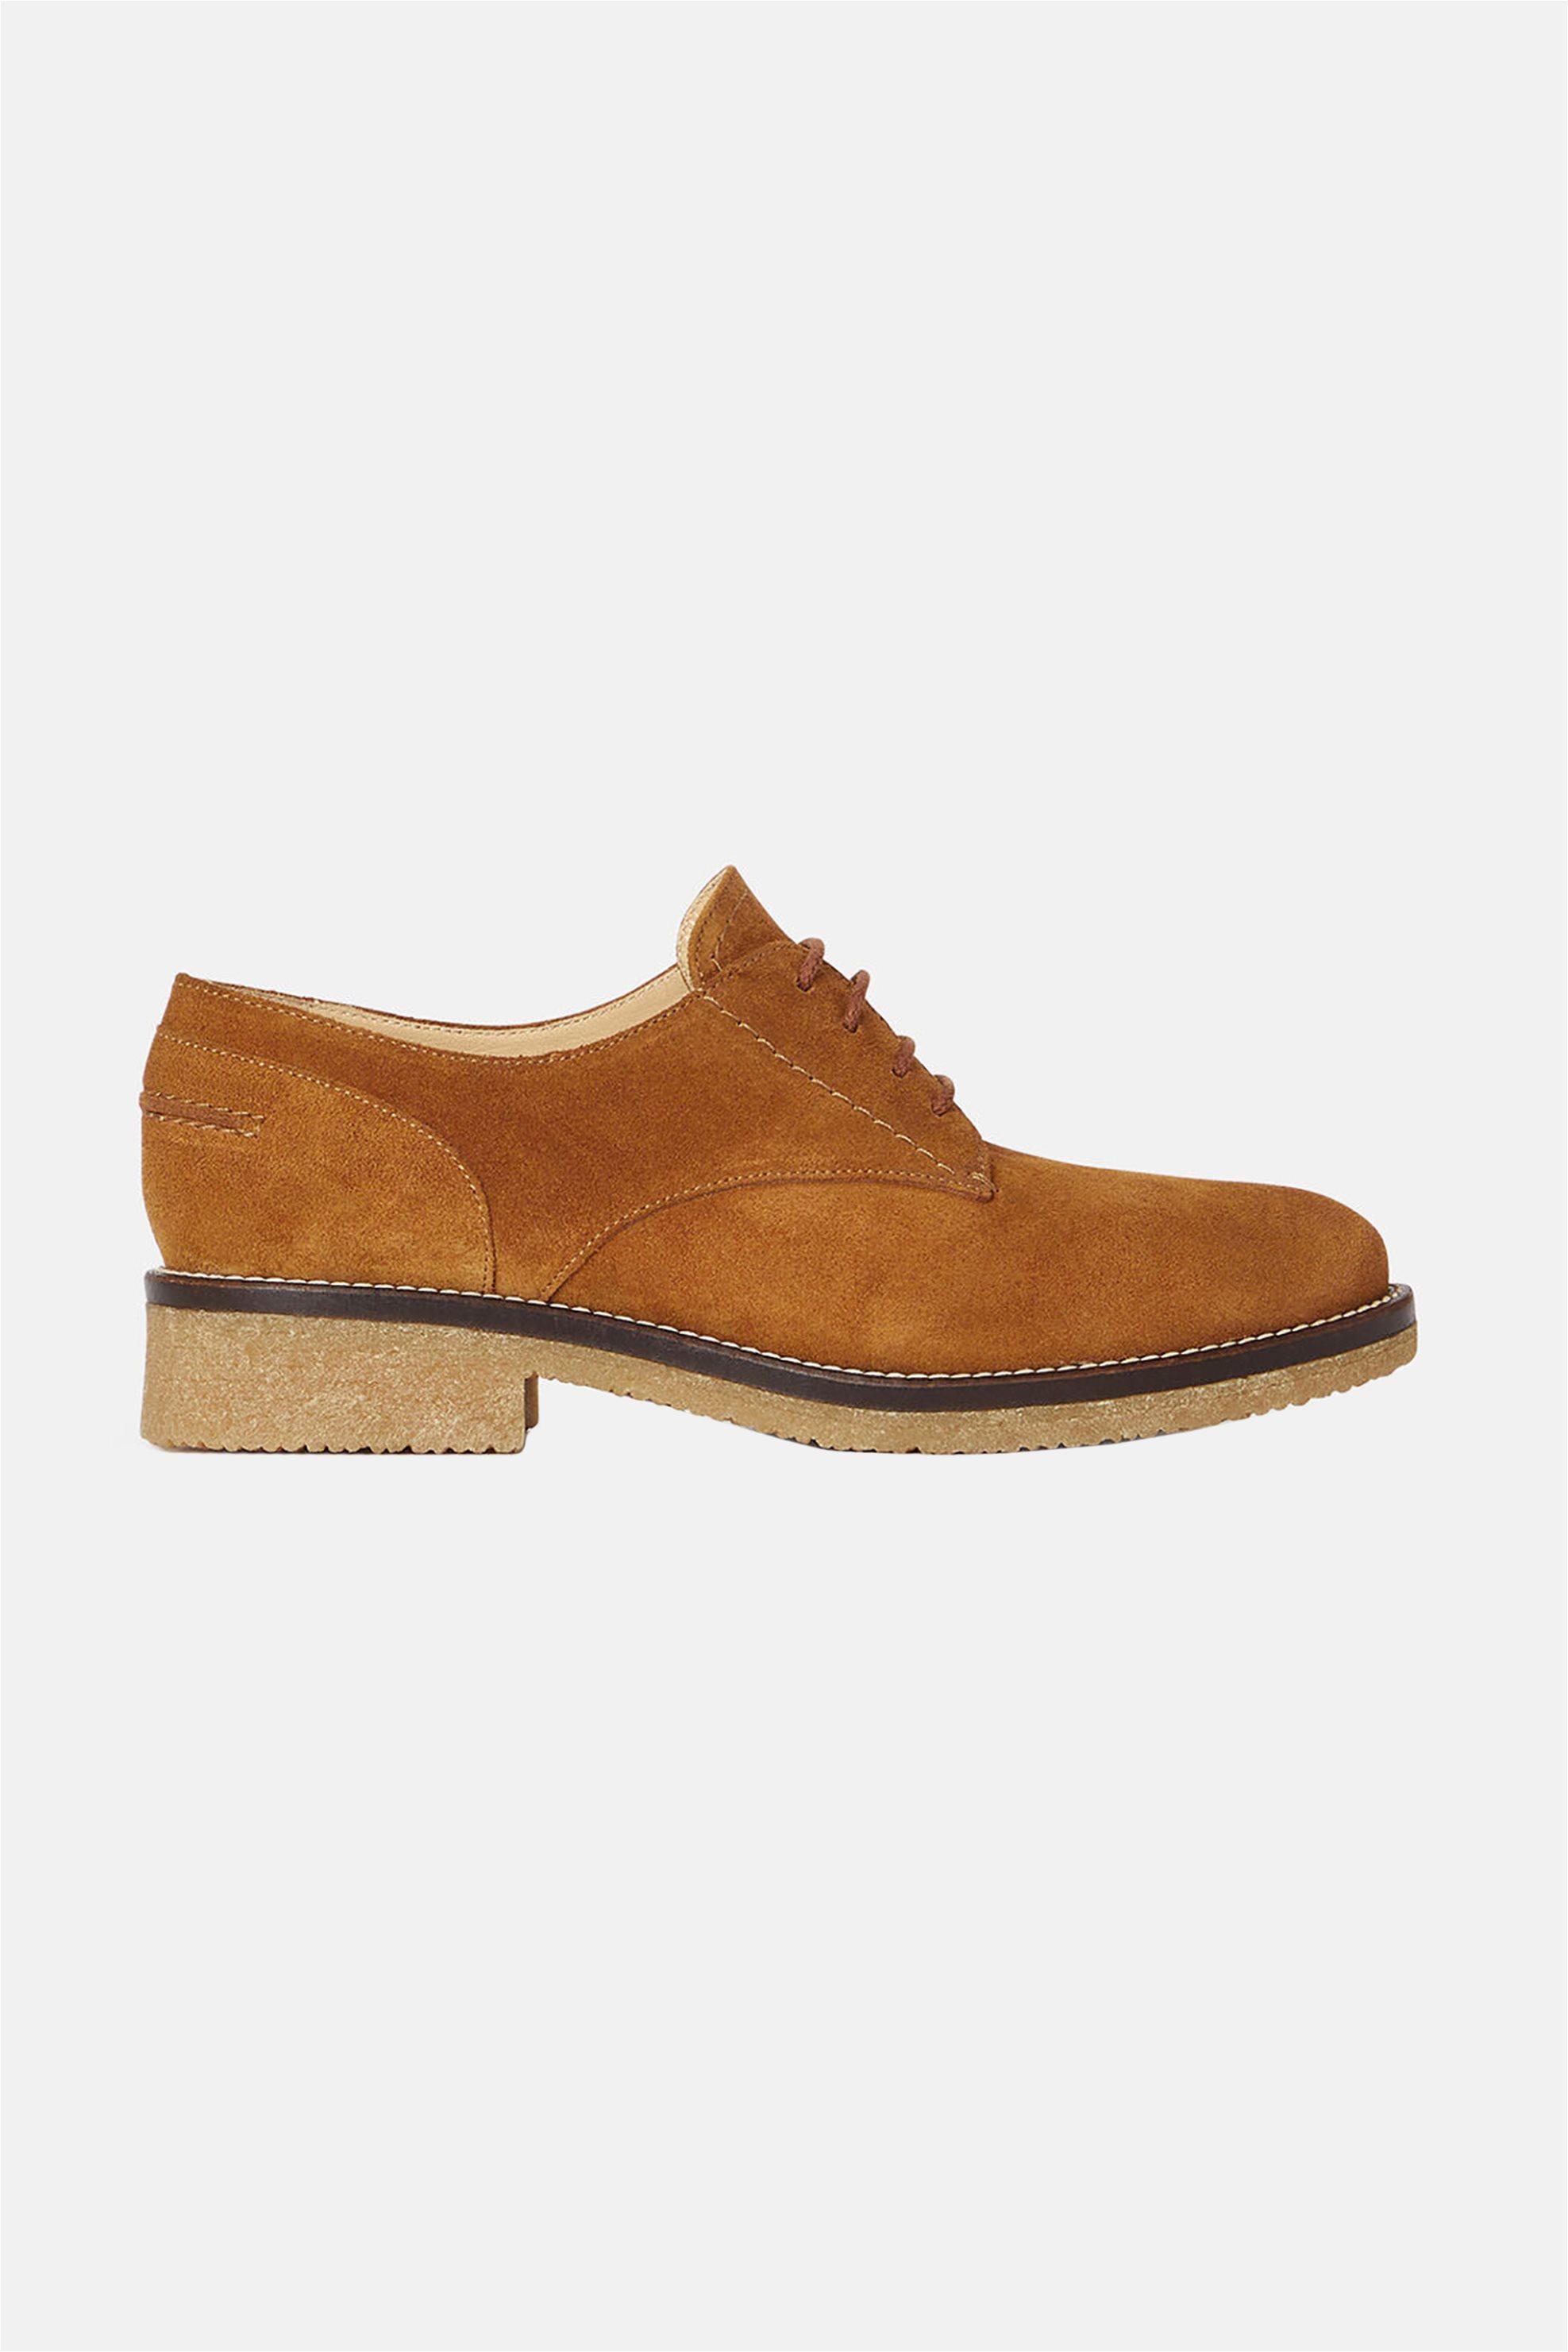 "Minelli γυναικεία suede Oxford παπούτσια ""Lohane"" – 834604 – Ταμπά"